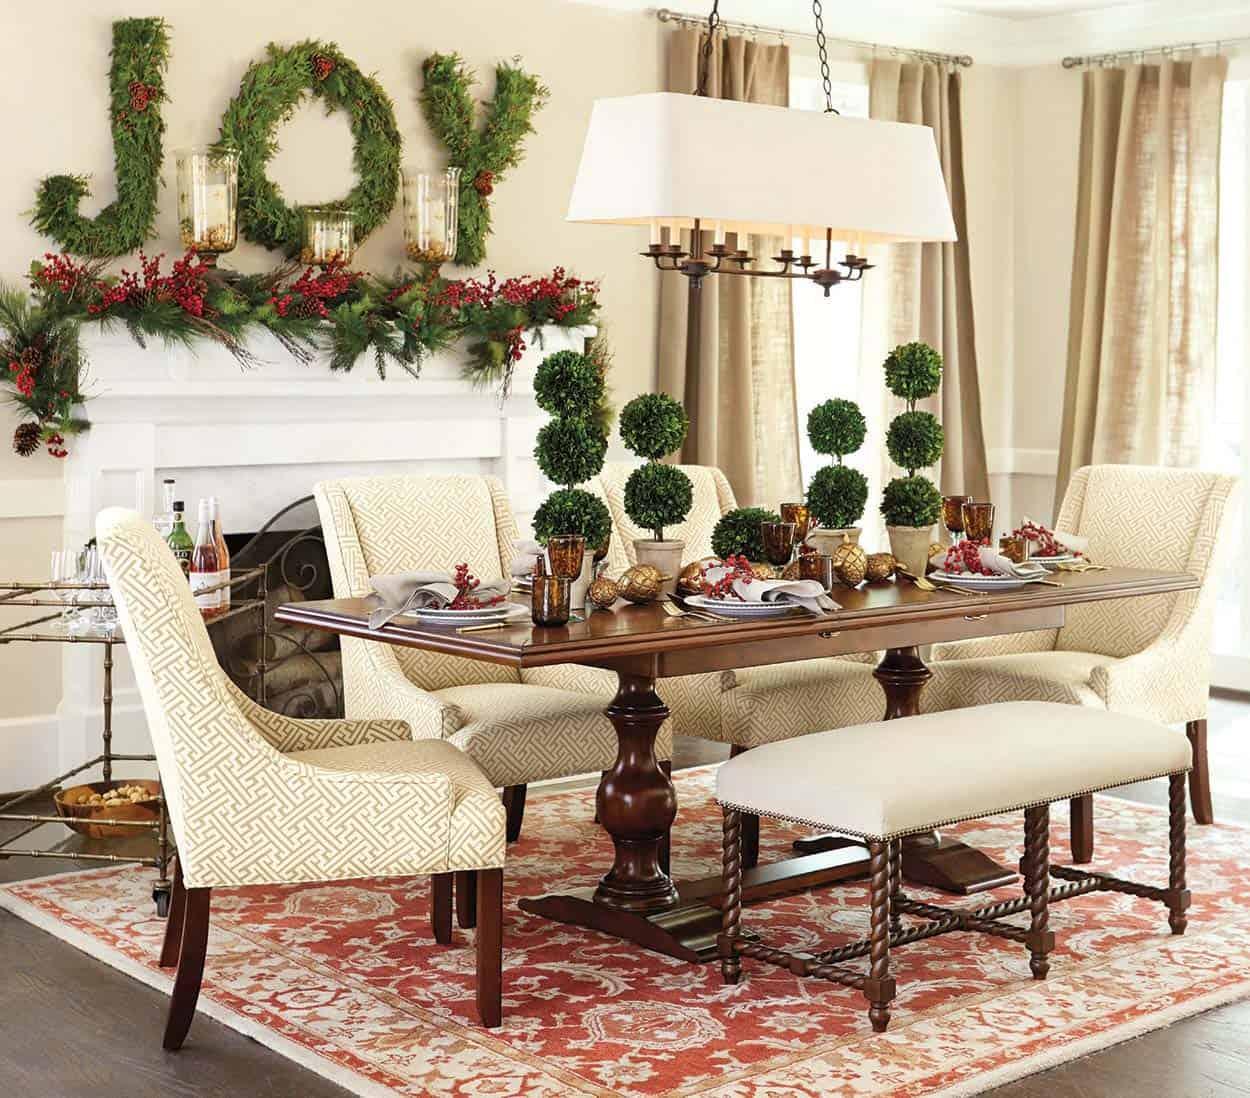 christmas-decor-ideas-rustic-country-17-1-kindesign